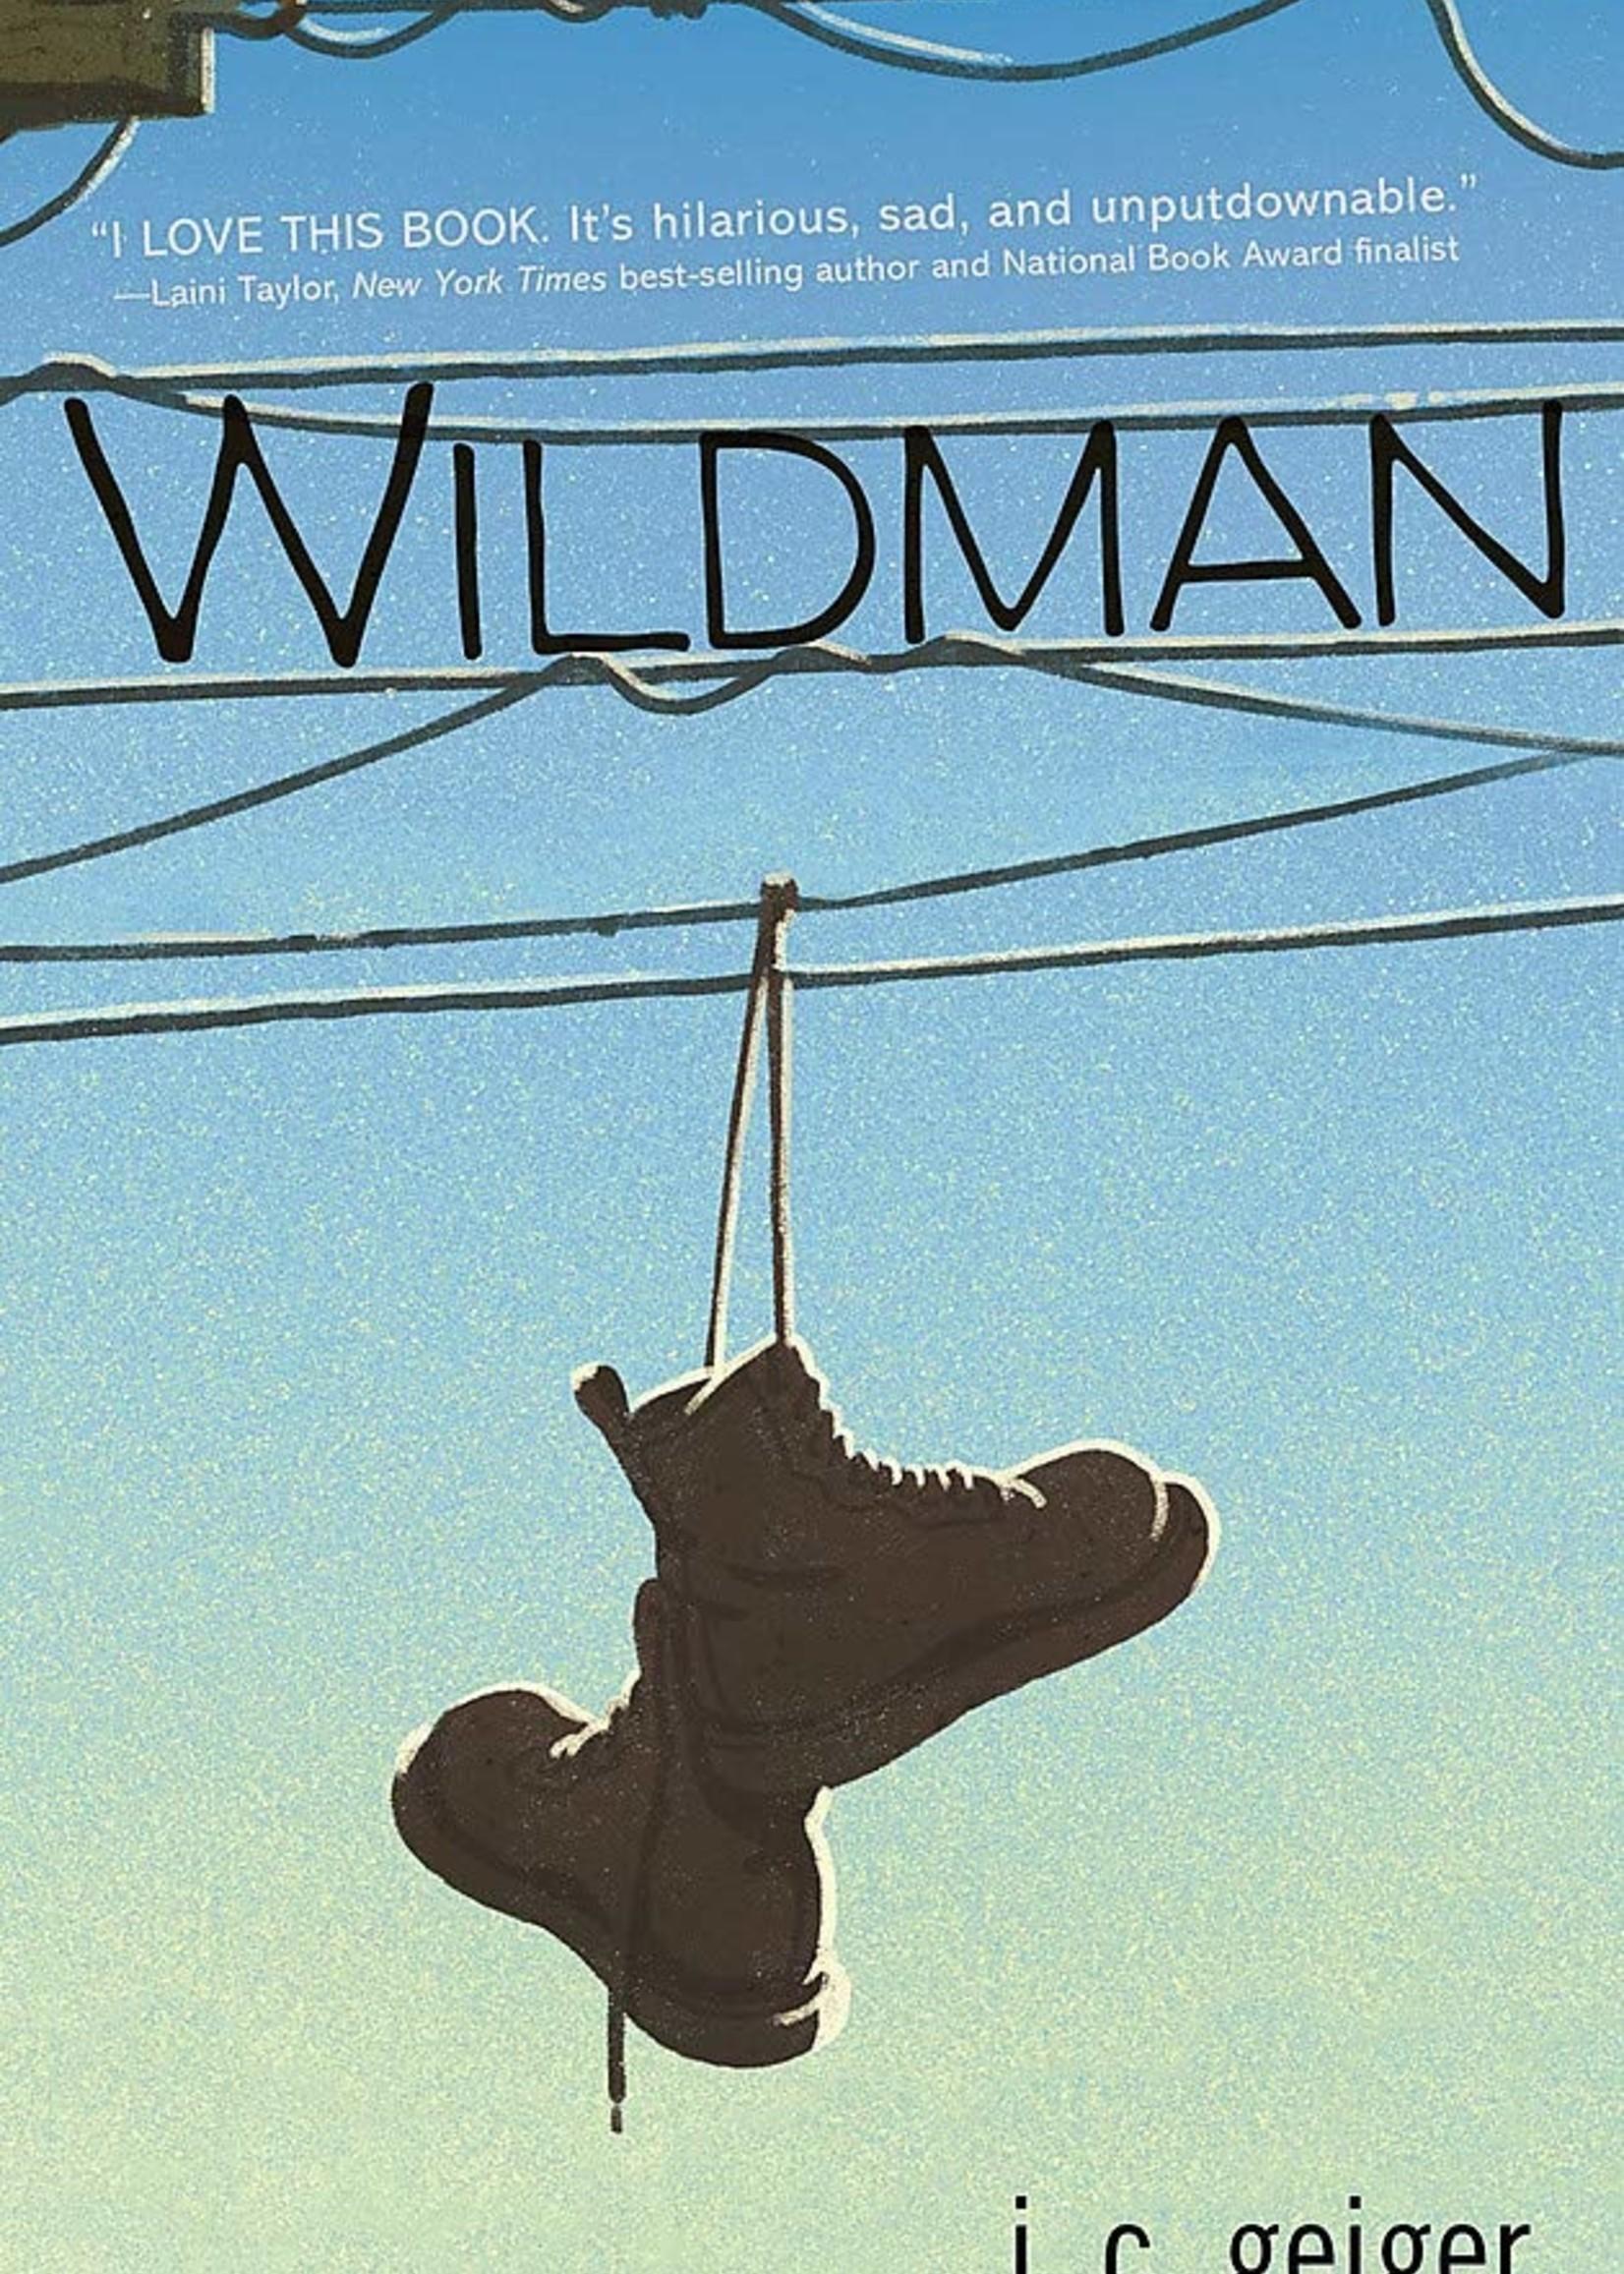 Wildman - Paperback